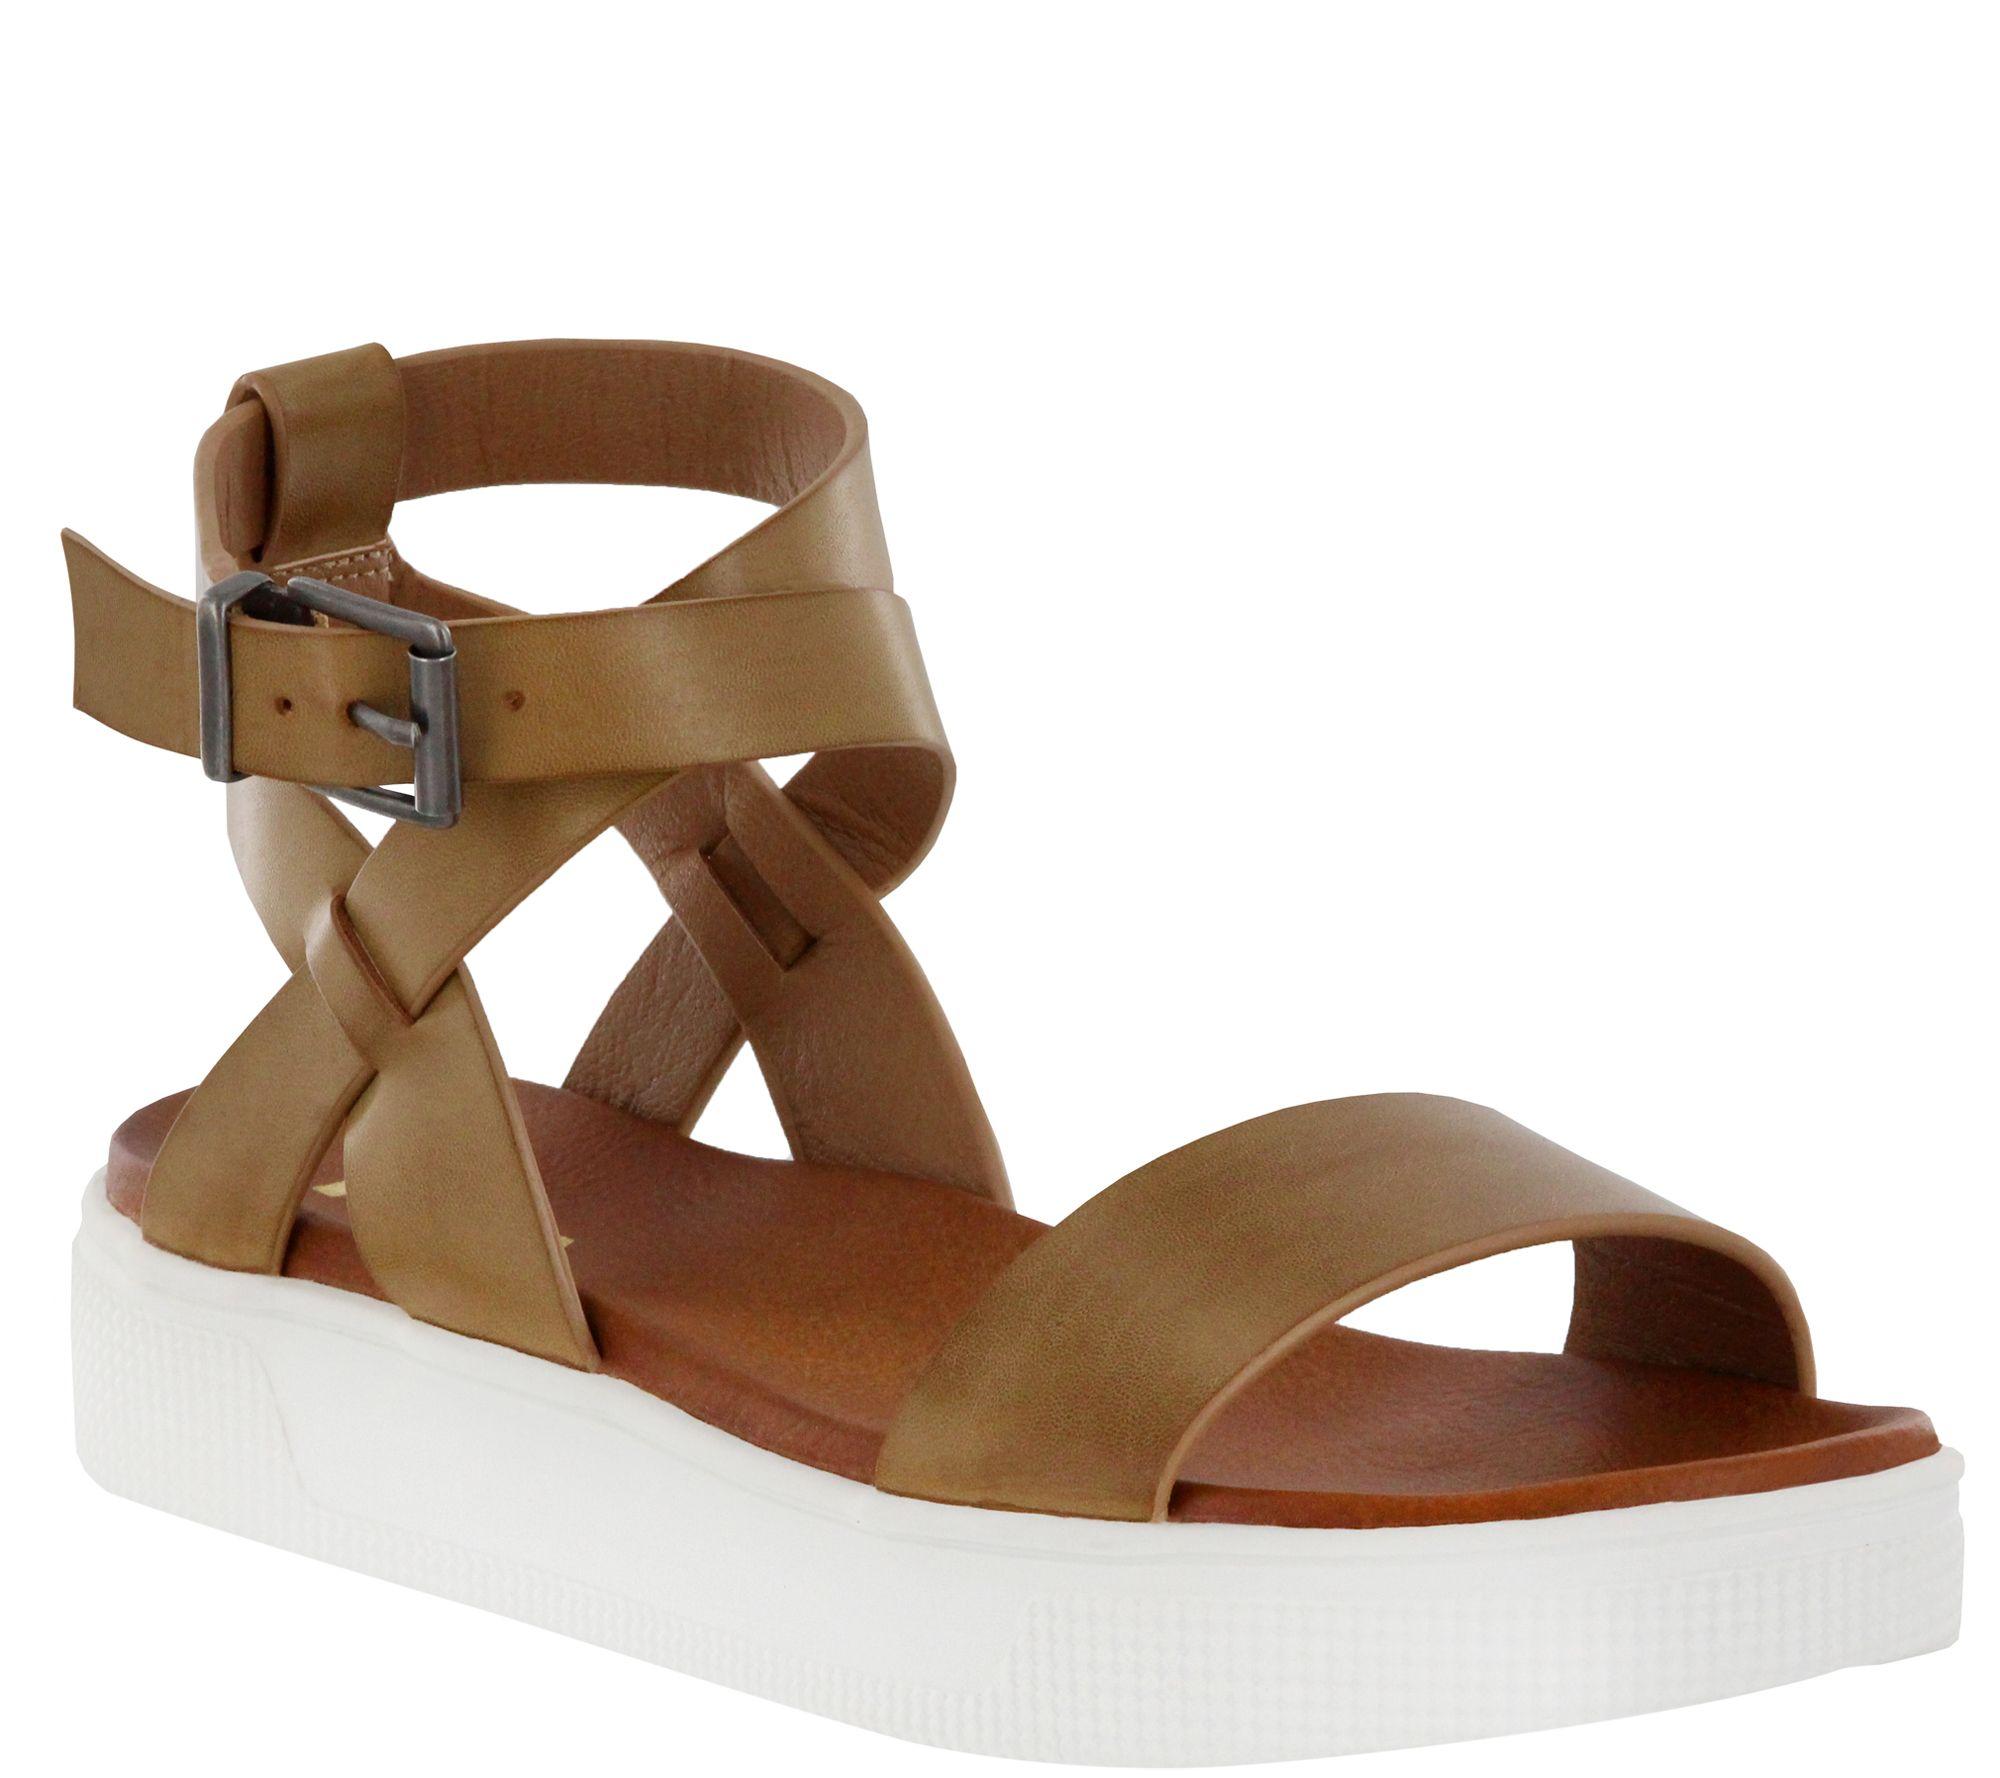 f25ecedb4b57 MIA Shoes Flat Ankle Strap Sandals - Calla - Page 1 — QVC.com